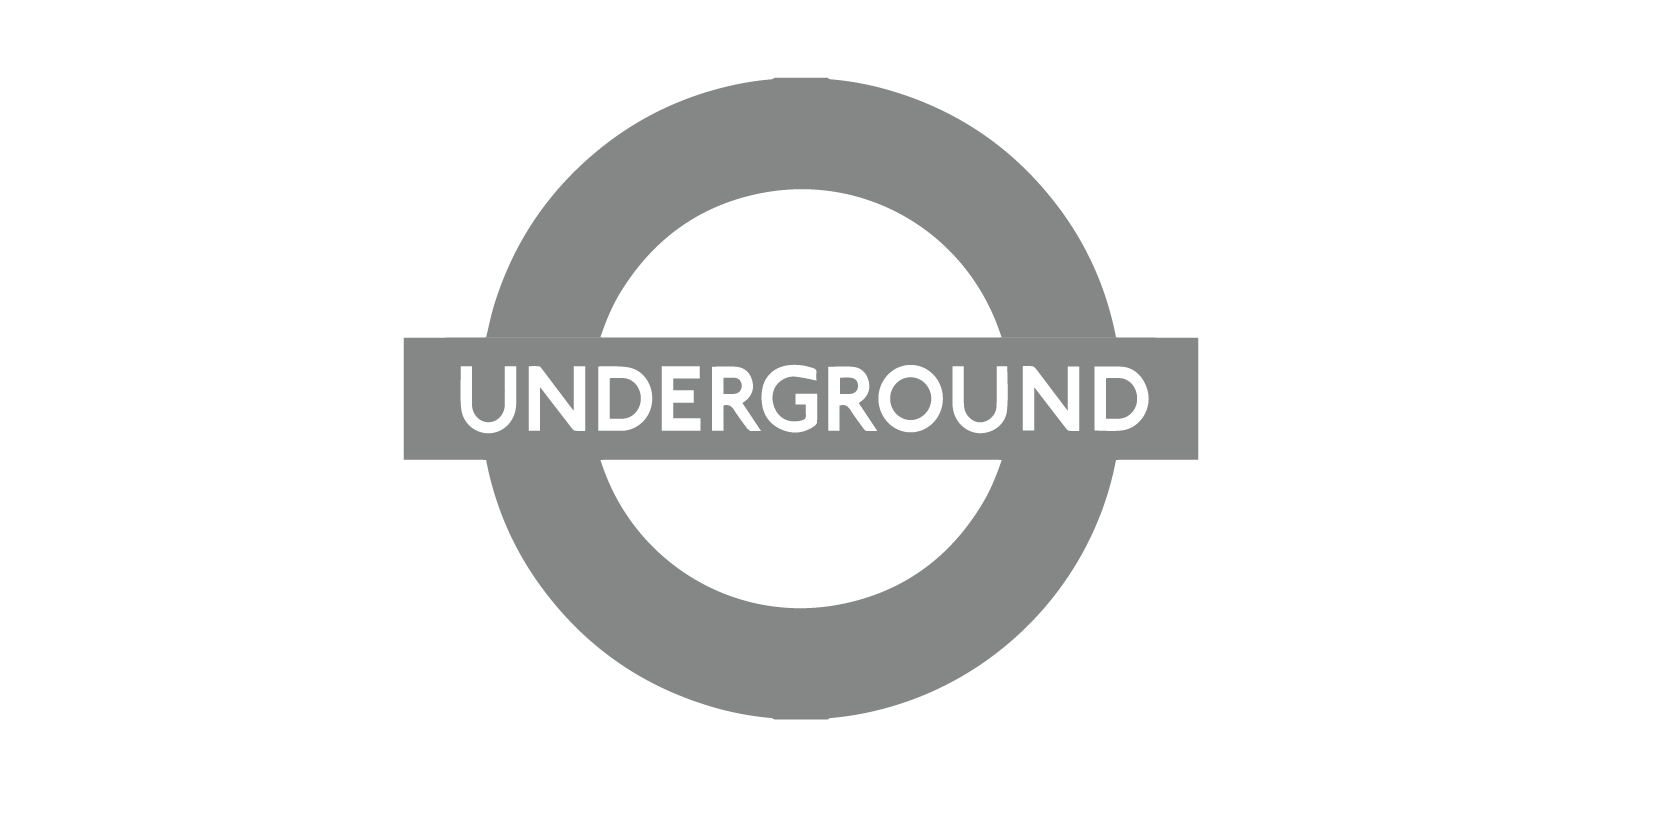 underground-small-widescreen-01